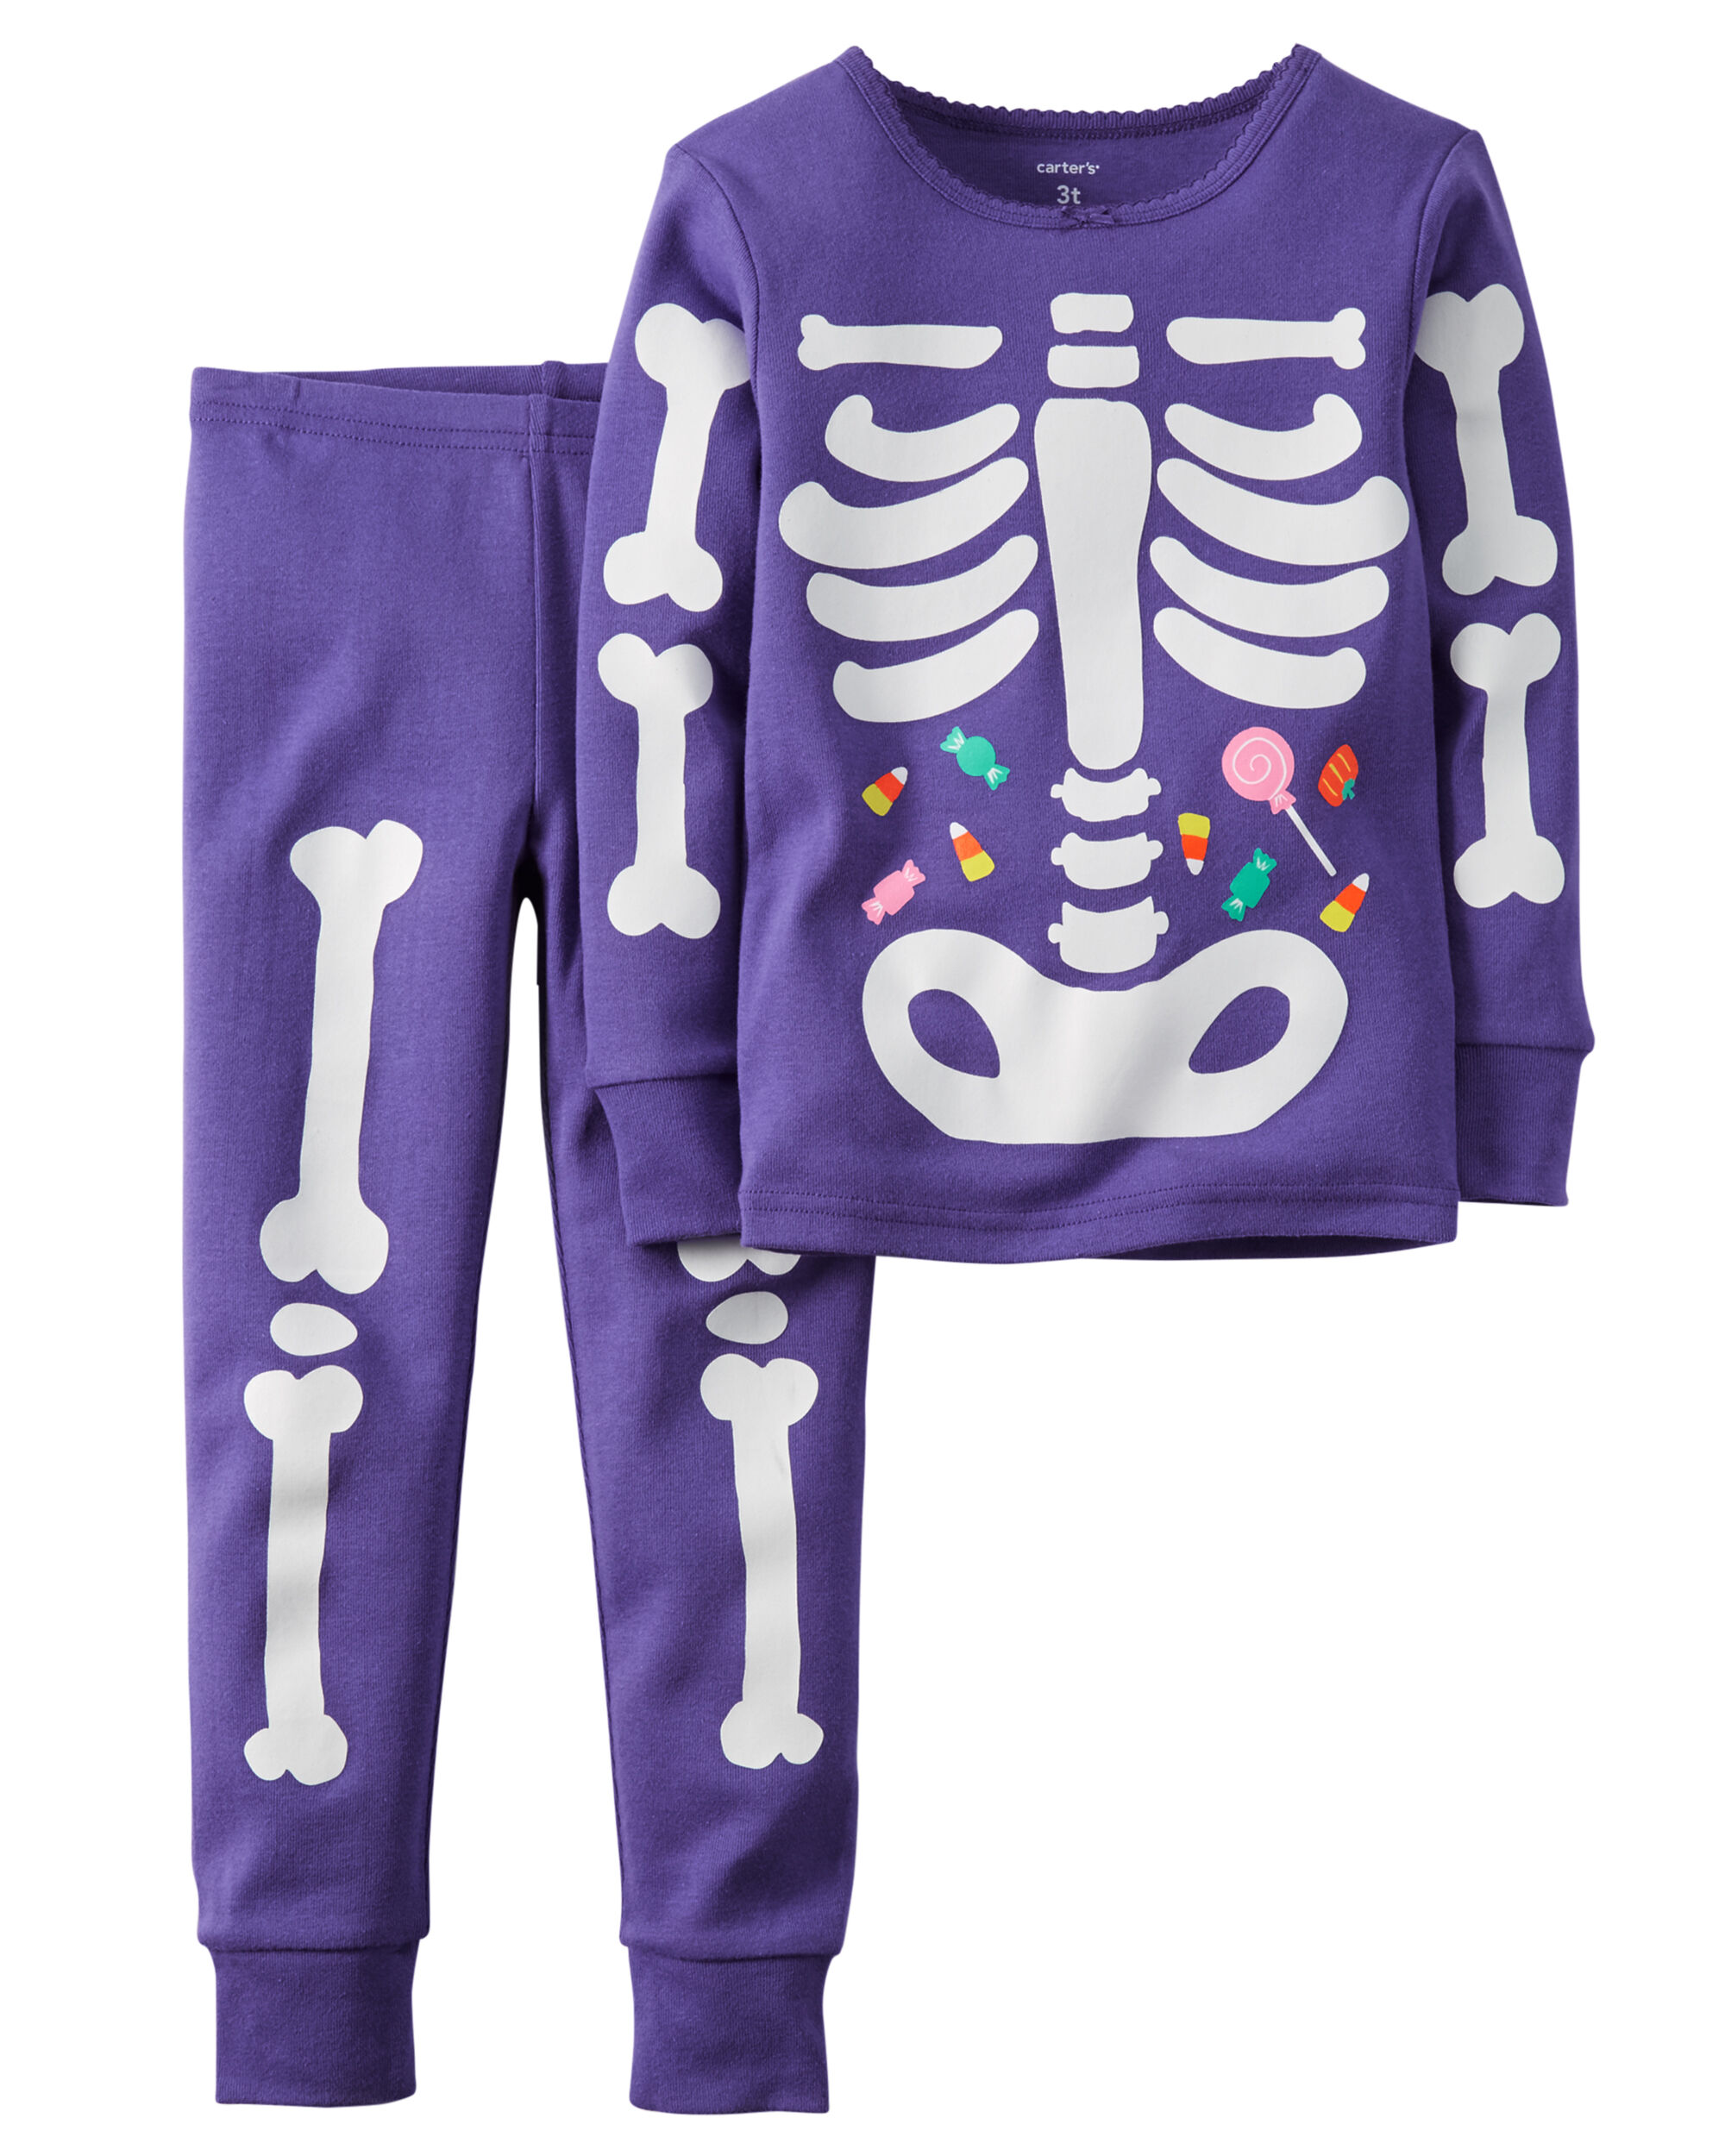 2 piece snug fit cotton glow in the dark halloween pjs loading zoom